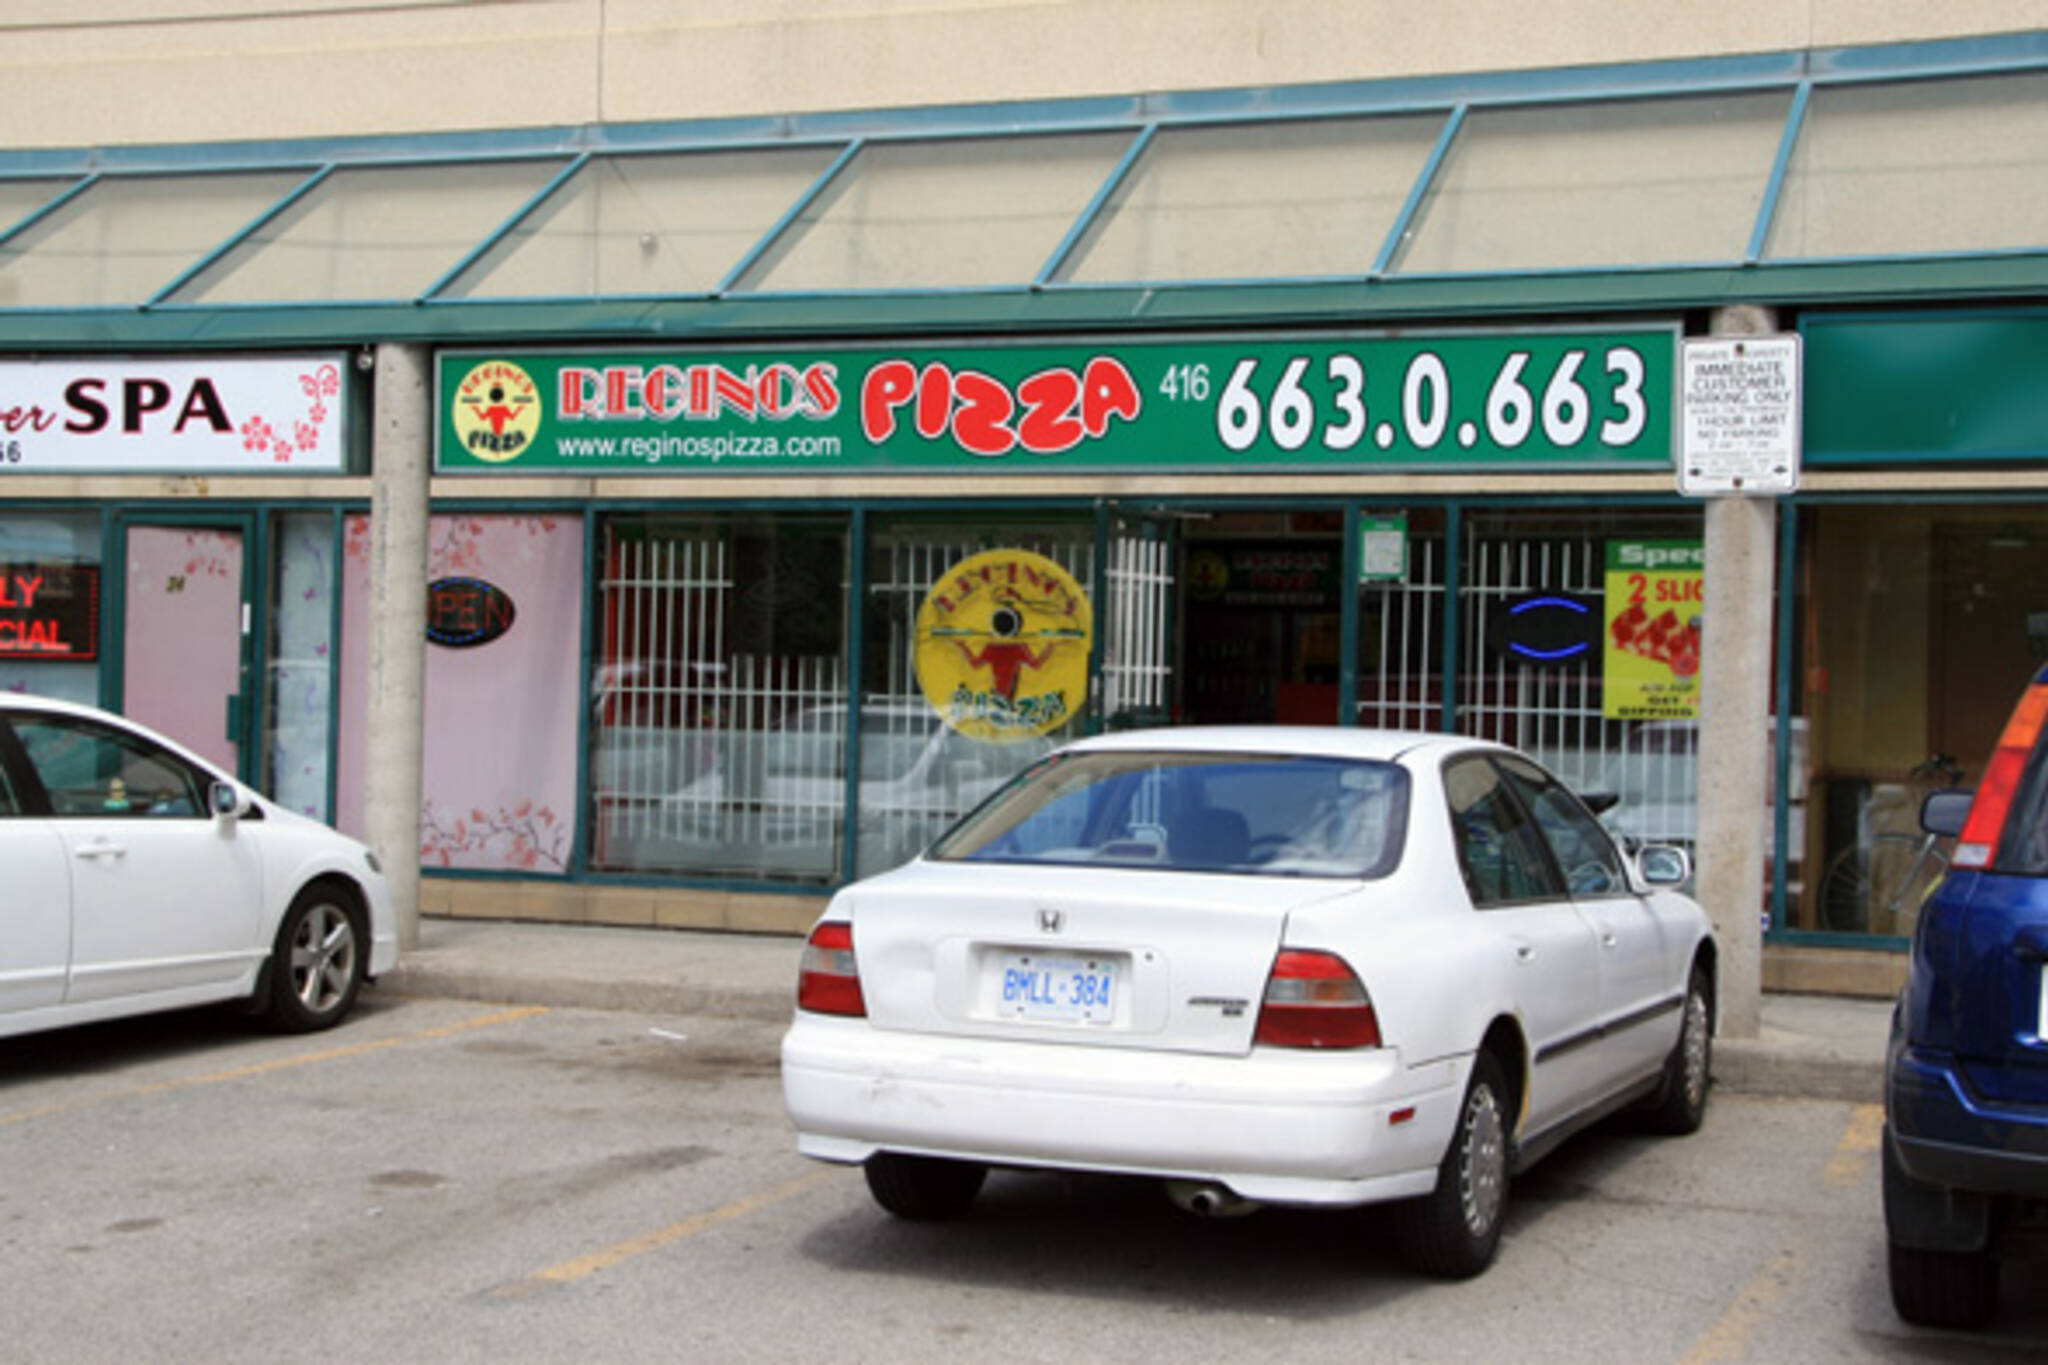 Reginos Pizza Toronto